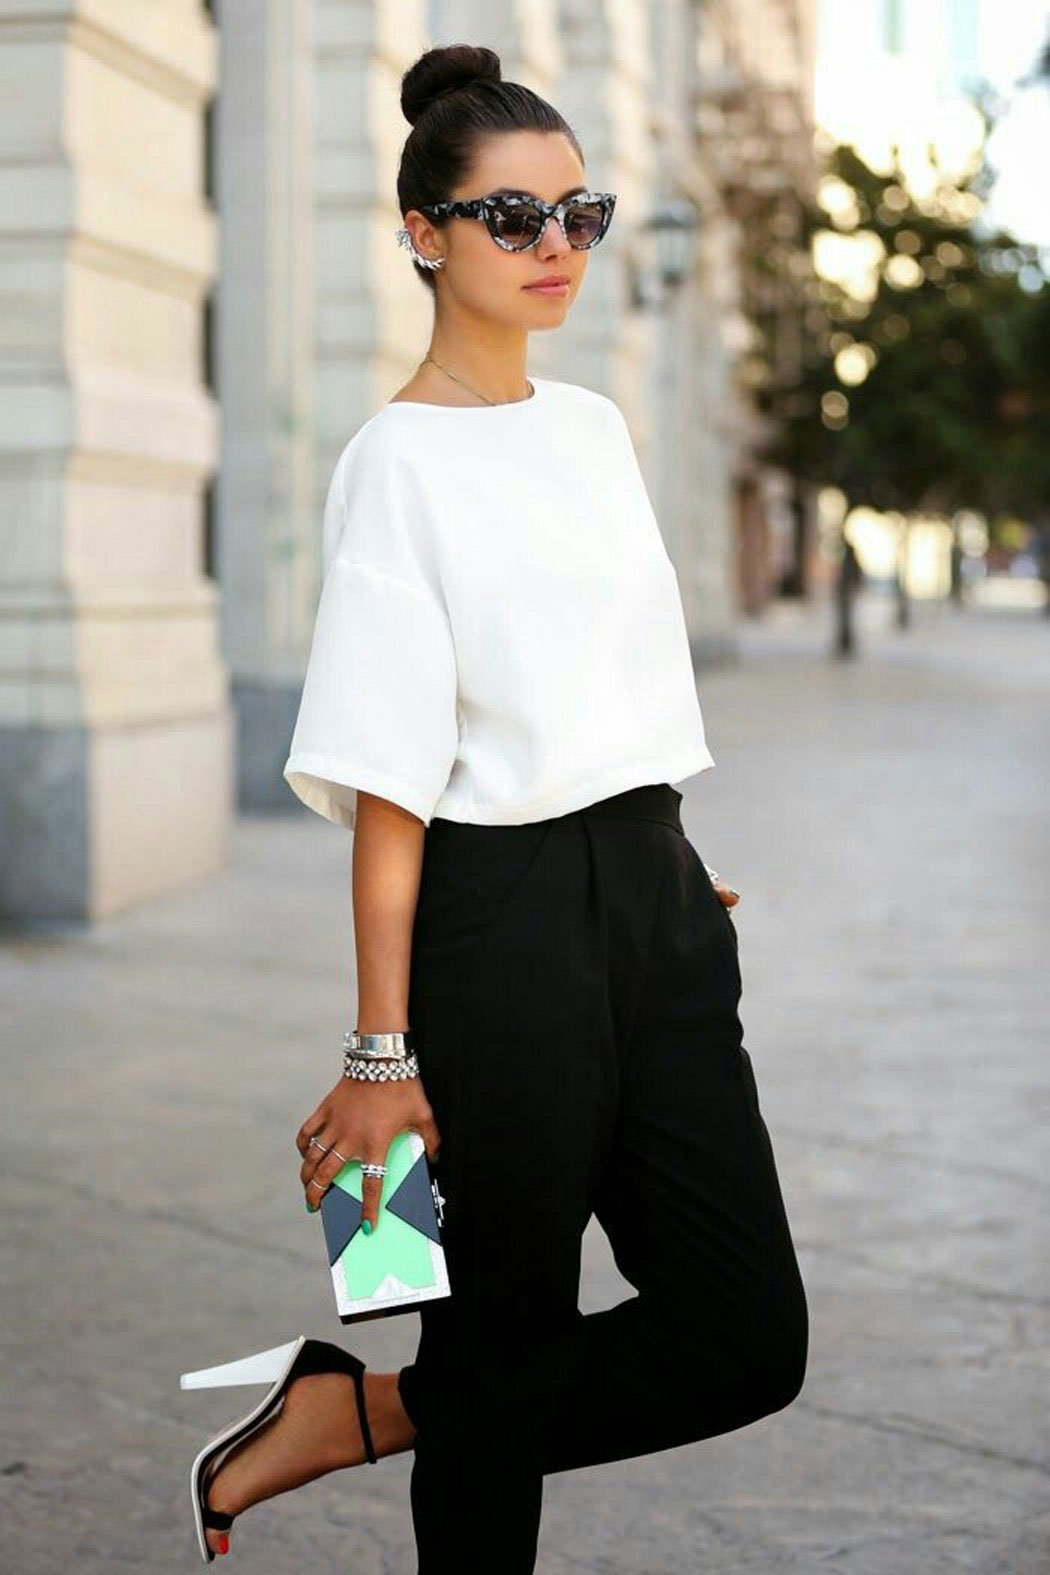 20 ideas de outfits que podr s usar para ir al trabajo